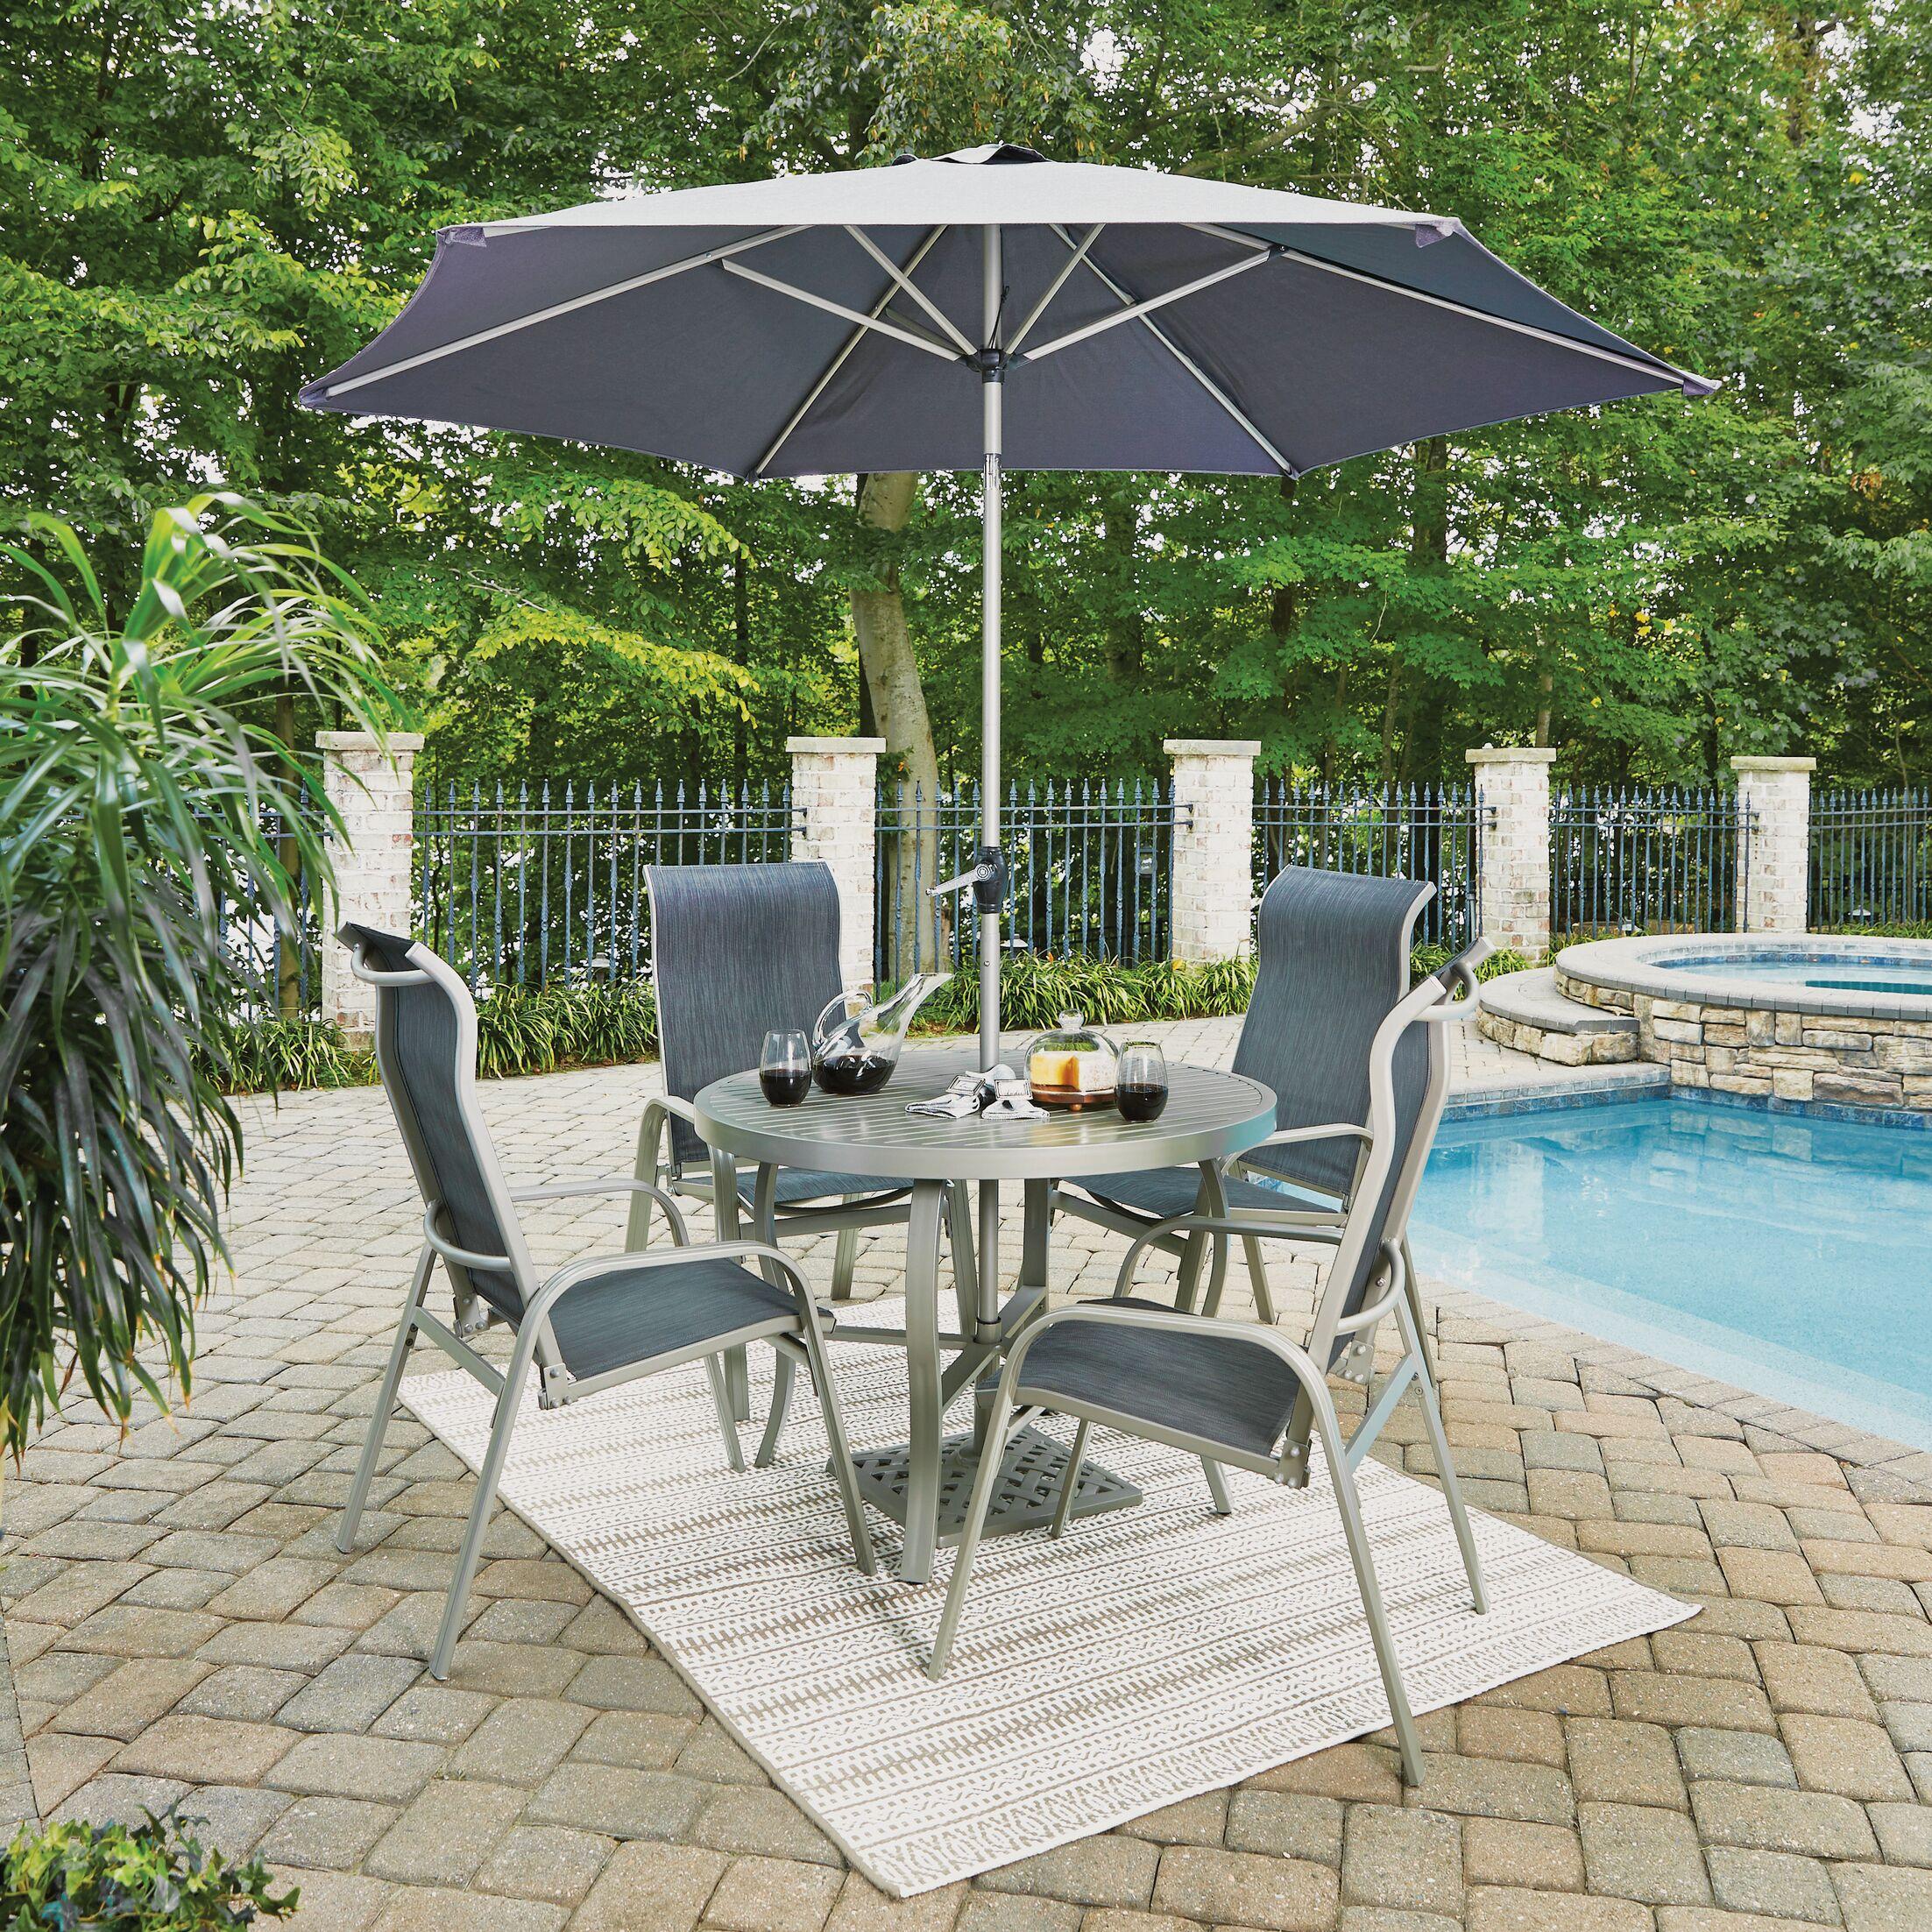 Dinan Outdoor 5 Piece Dining Set with Umbrella Table Size: 28.75